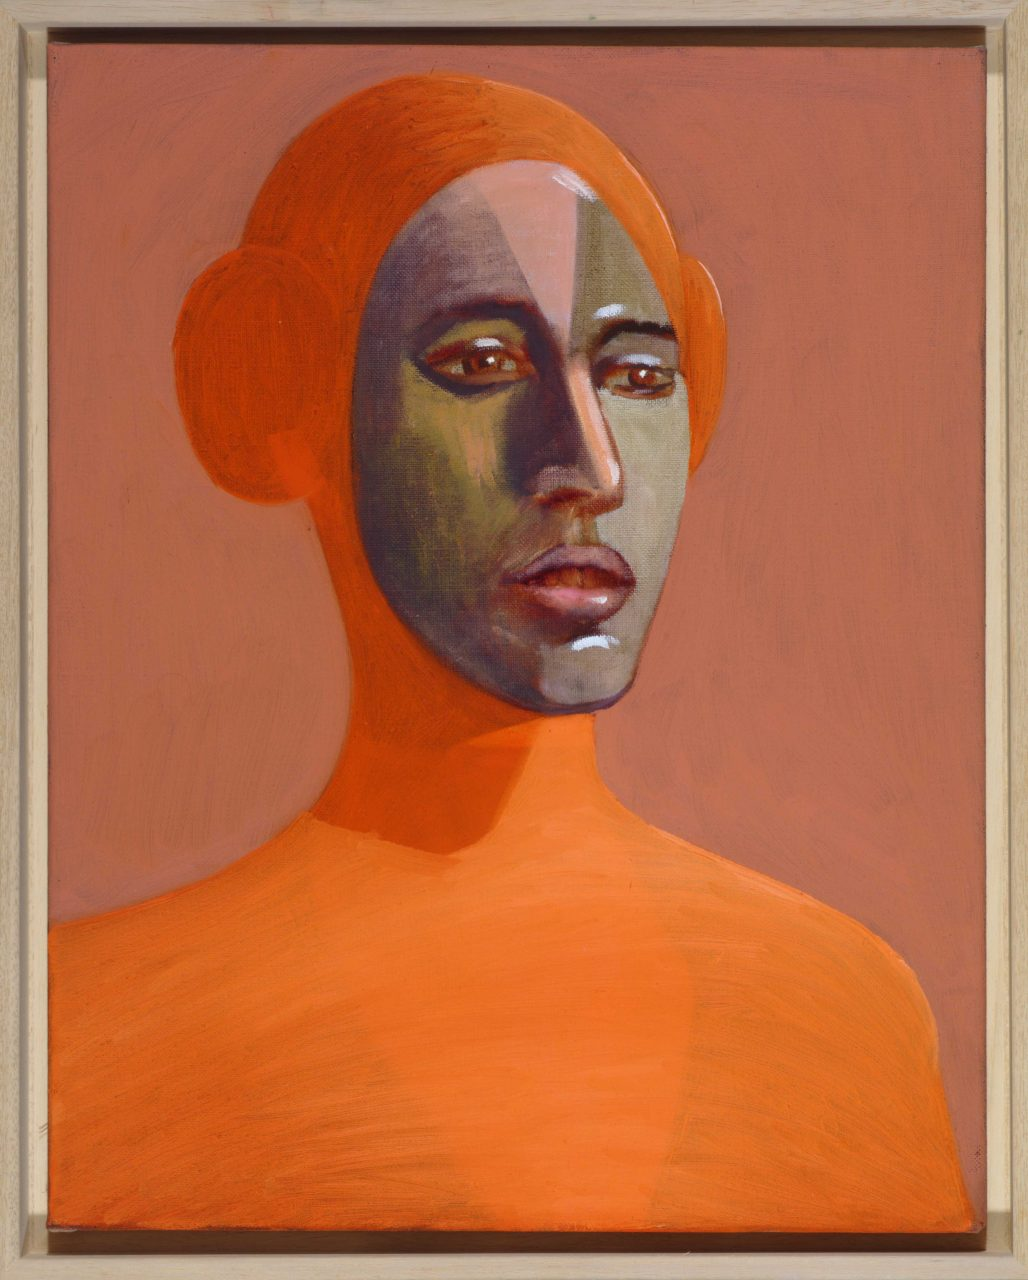 Kopf, 50x40cm, oil on canvas, 2012, collection Mohammed Abdul Latif Jameel, Saudi- Arabia